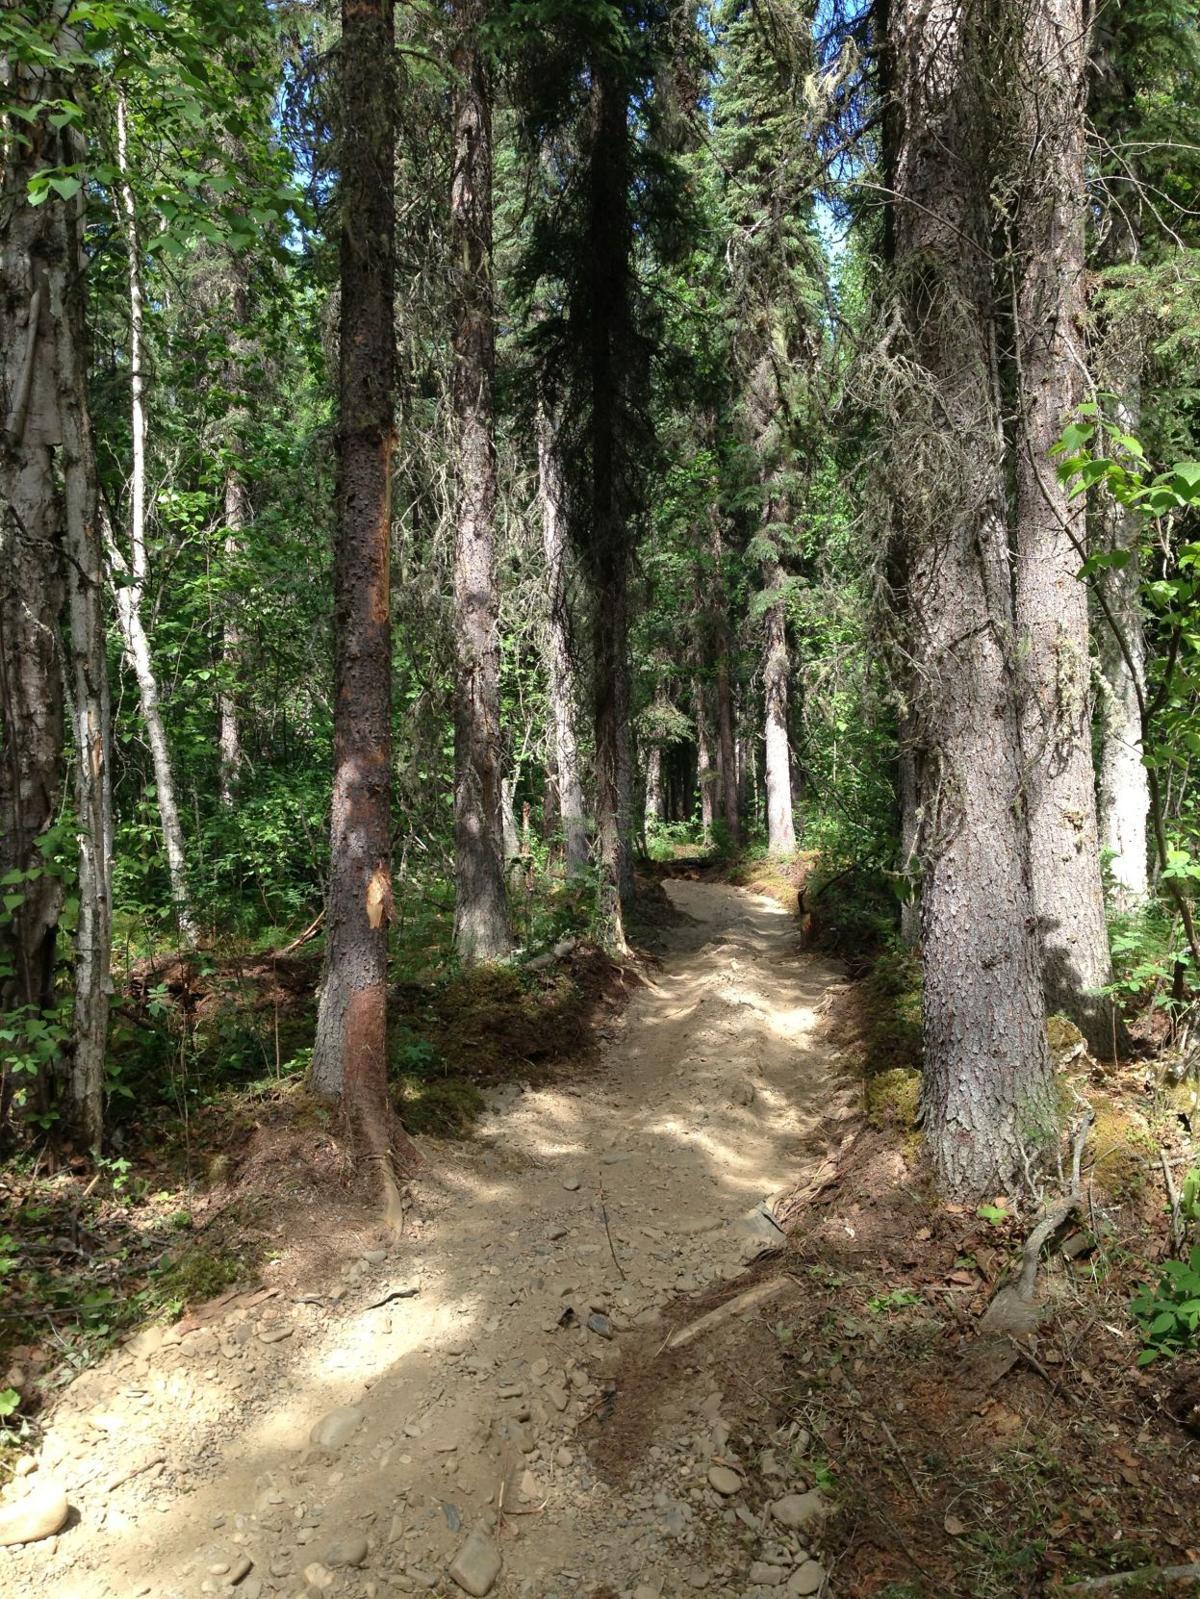 Trail work ahead: Three projects taking shape around Fairbanks